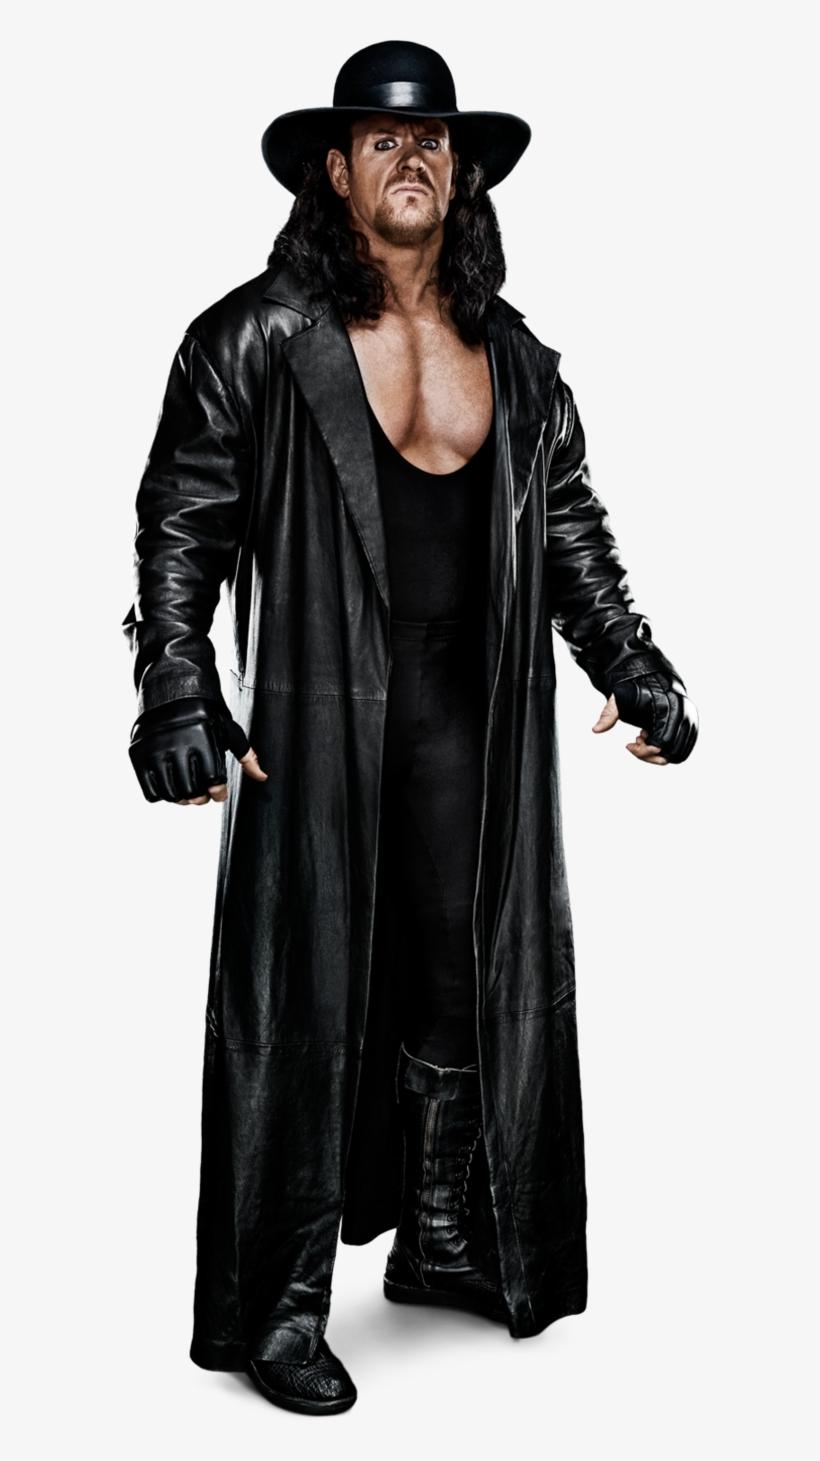 Undertaker Stats Png By Https - Wwe World Heavyweight Champion Undertaker, transparent png #1601863